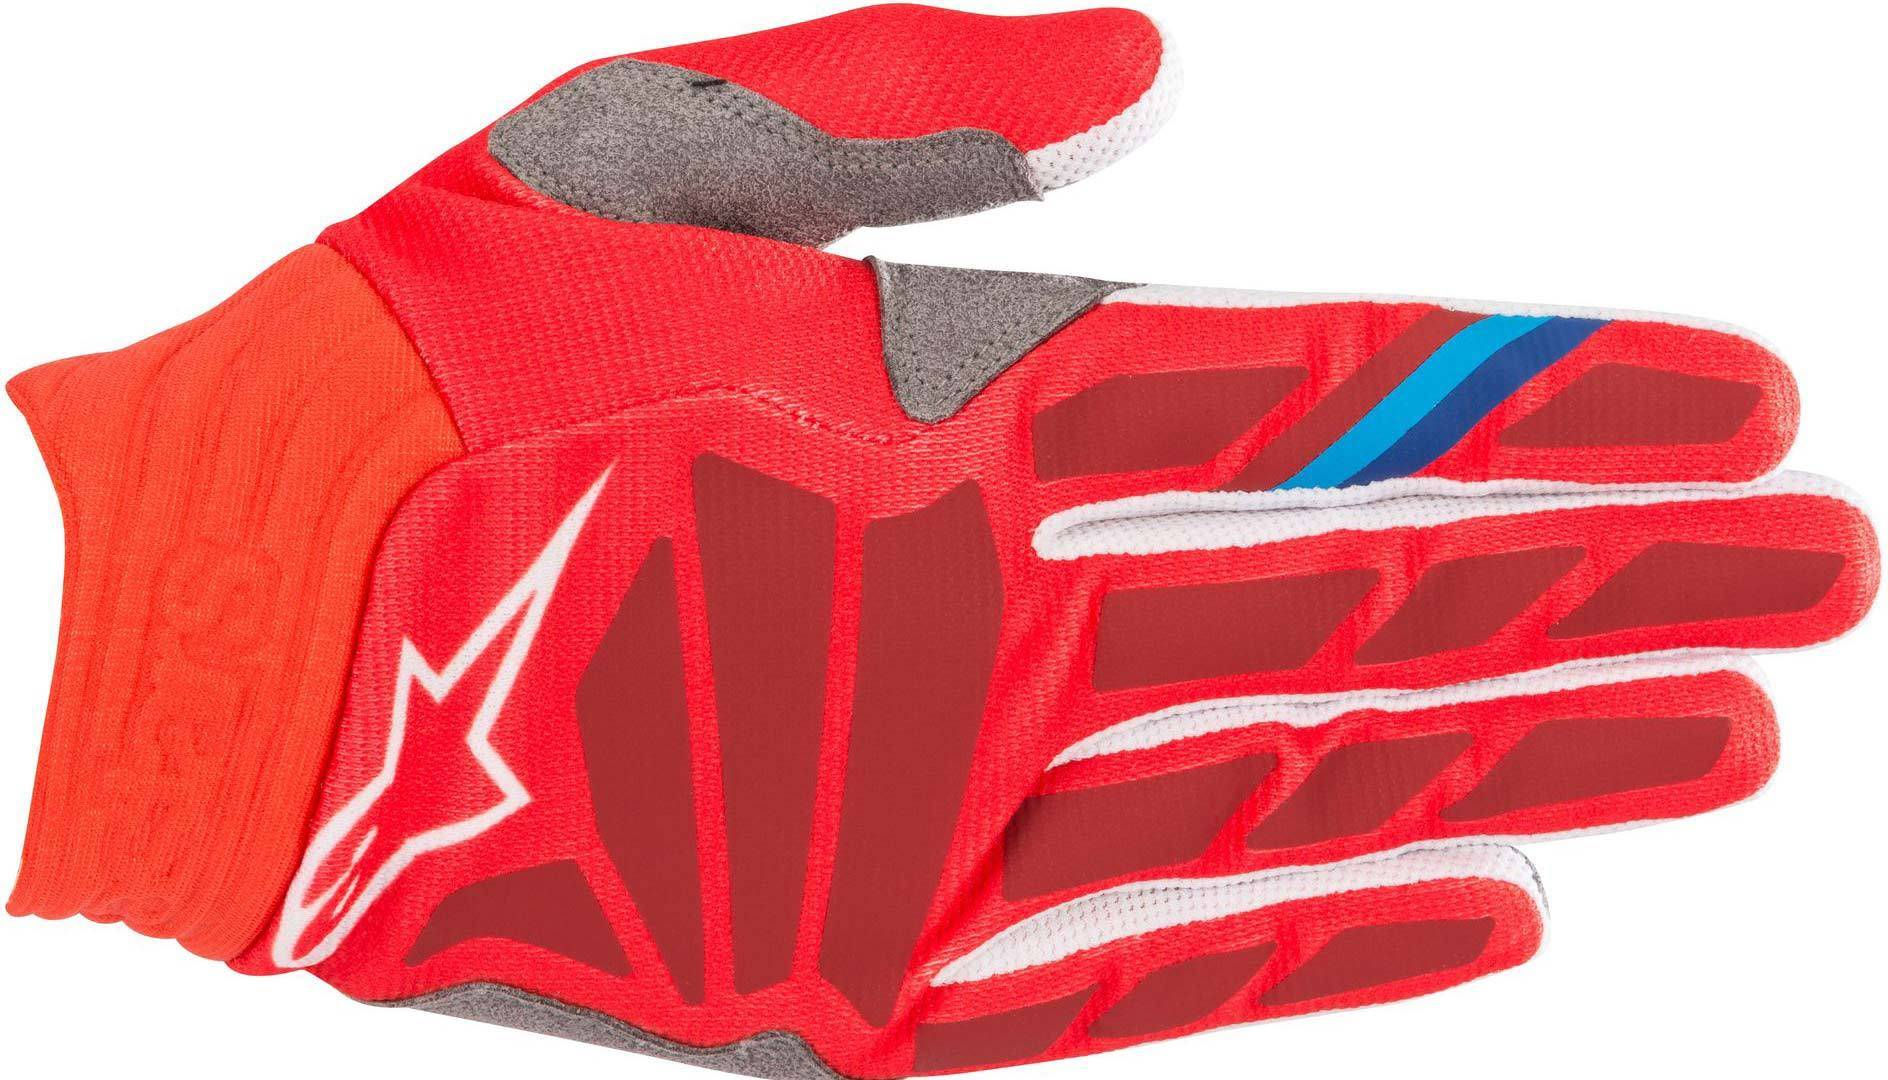 Alpinestars Aviator Motocross Gloves Red S